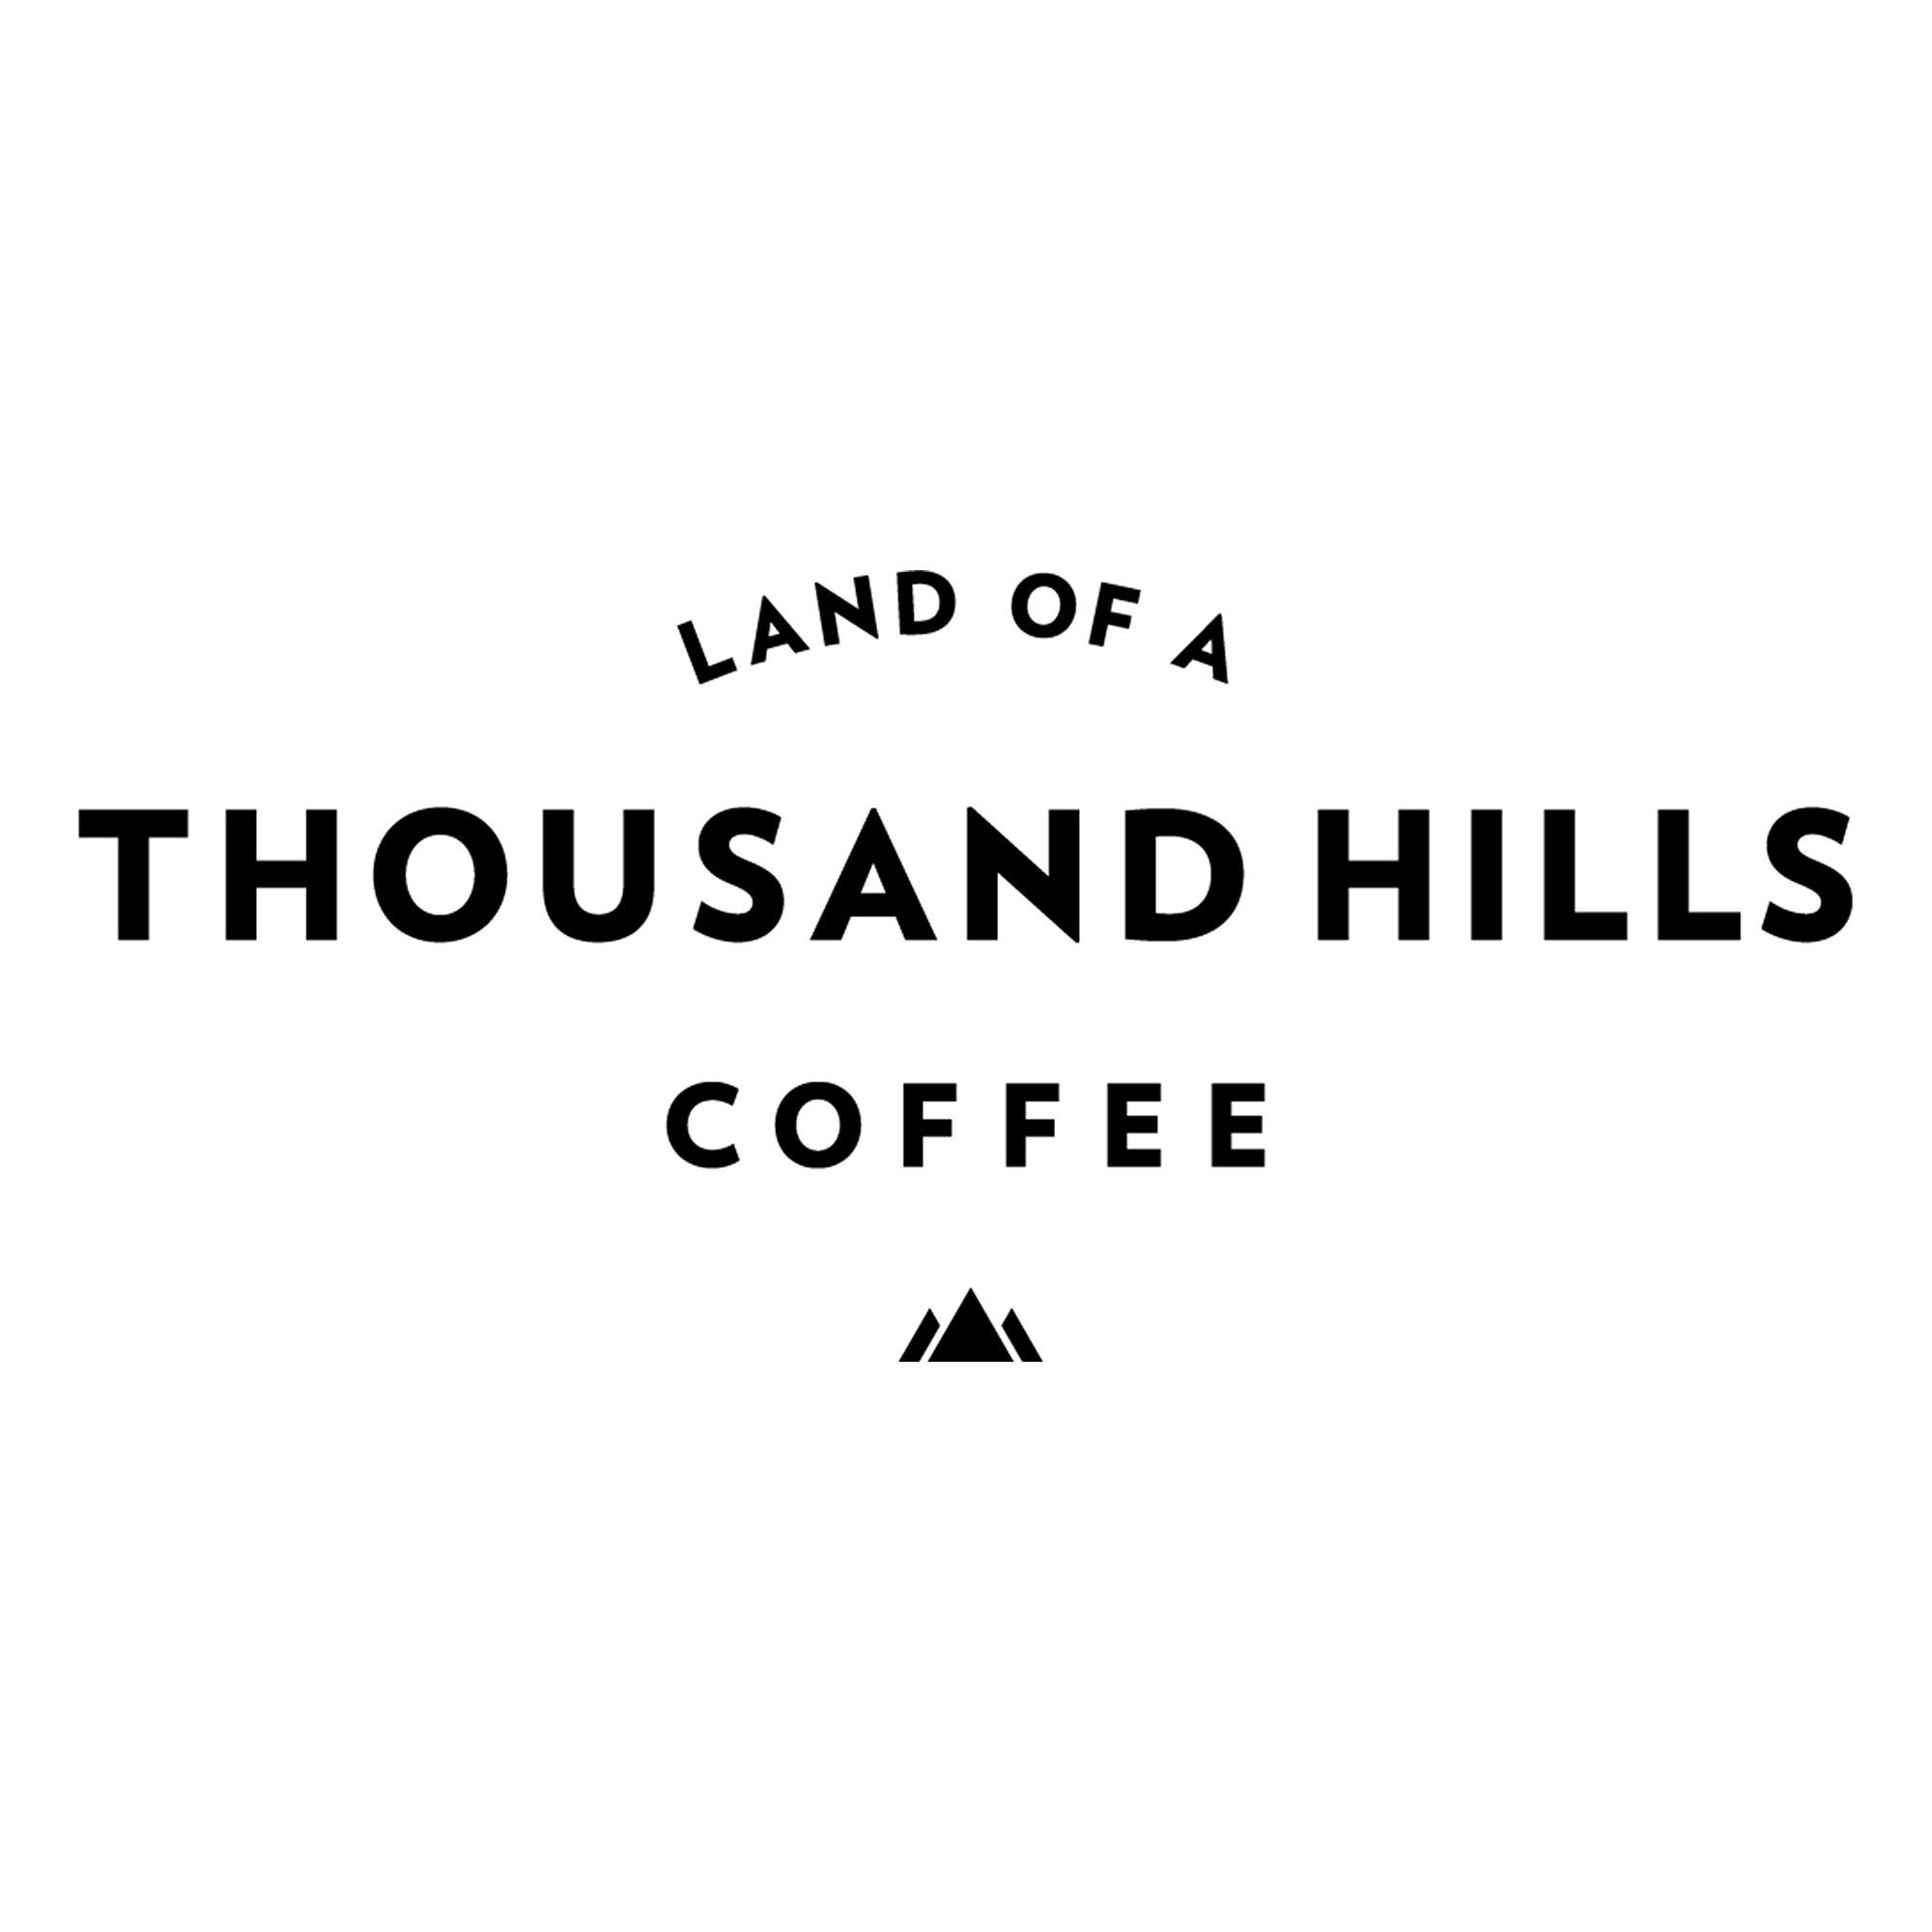 Land of 1000 hills.jpg